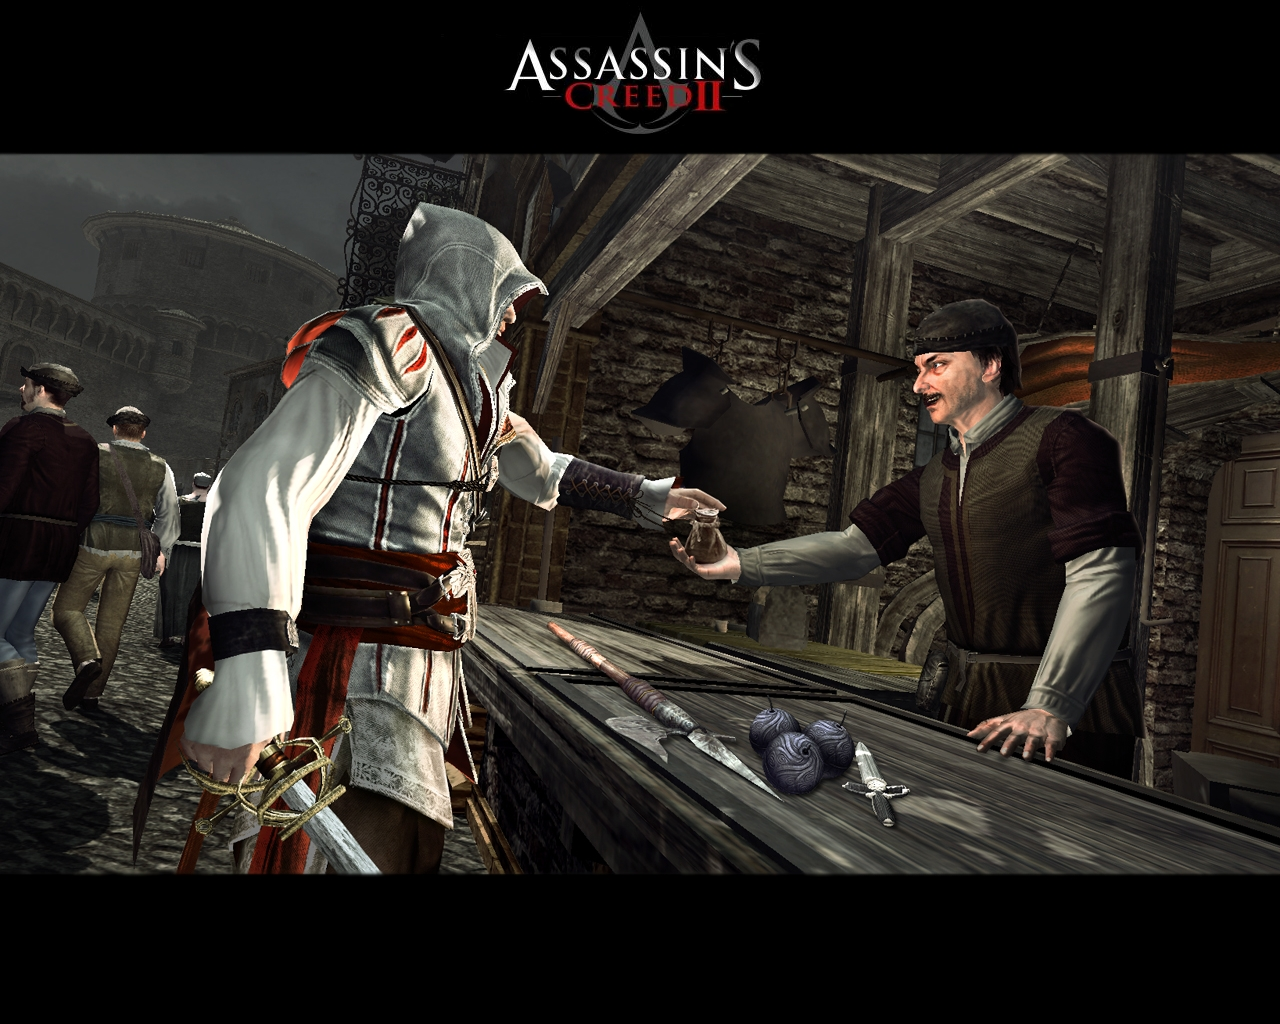 Assassins creed brotherhood pron pics xxx gallery